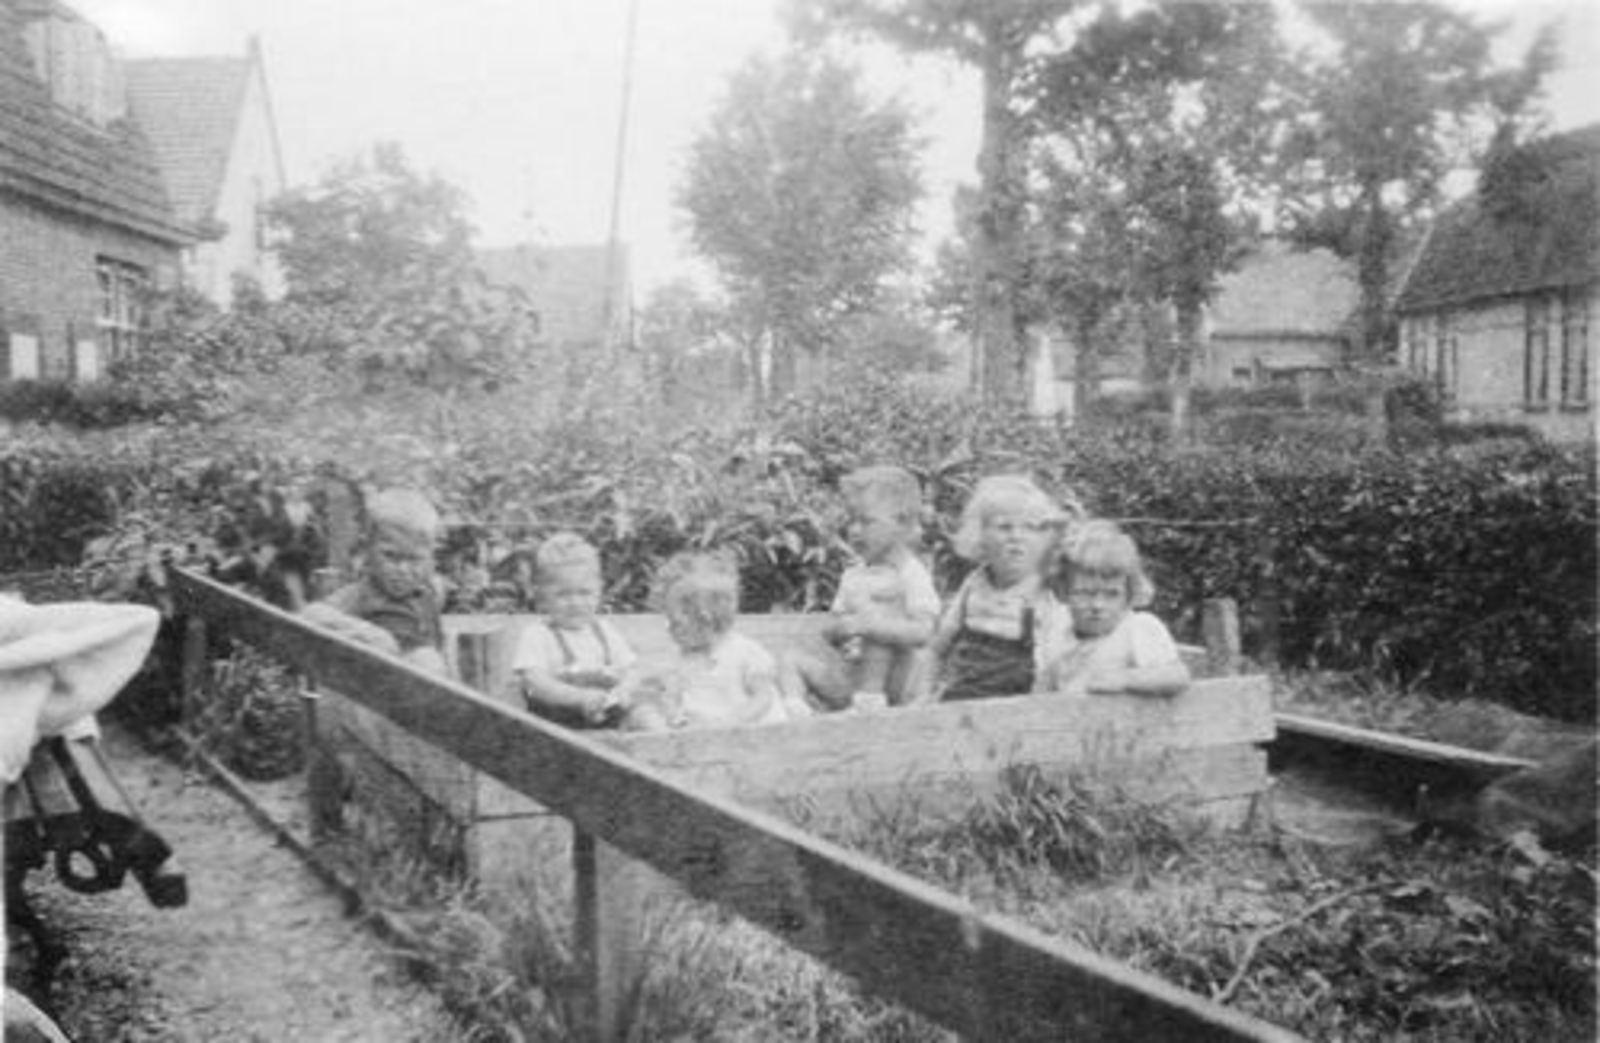 Fortweg W 0039 1944± Huize Koolbergen met Kinderen in Zandbak 01